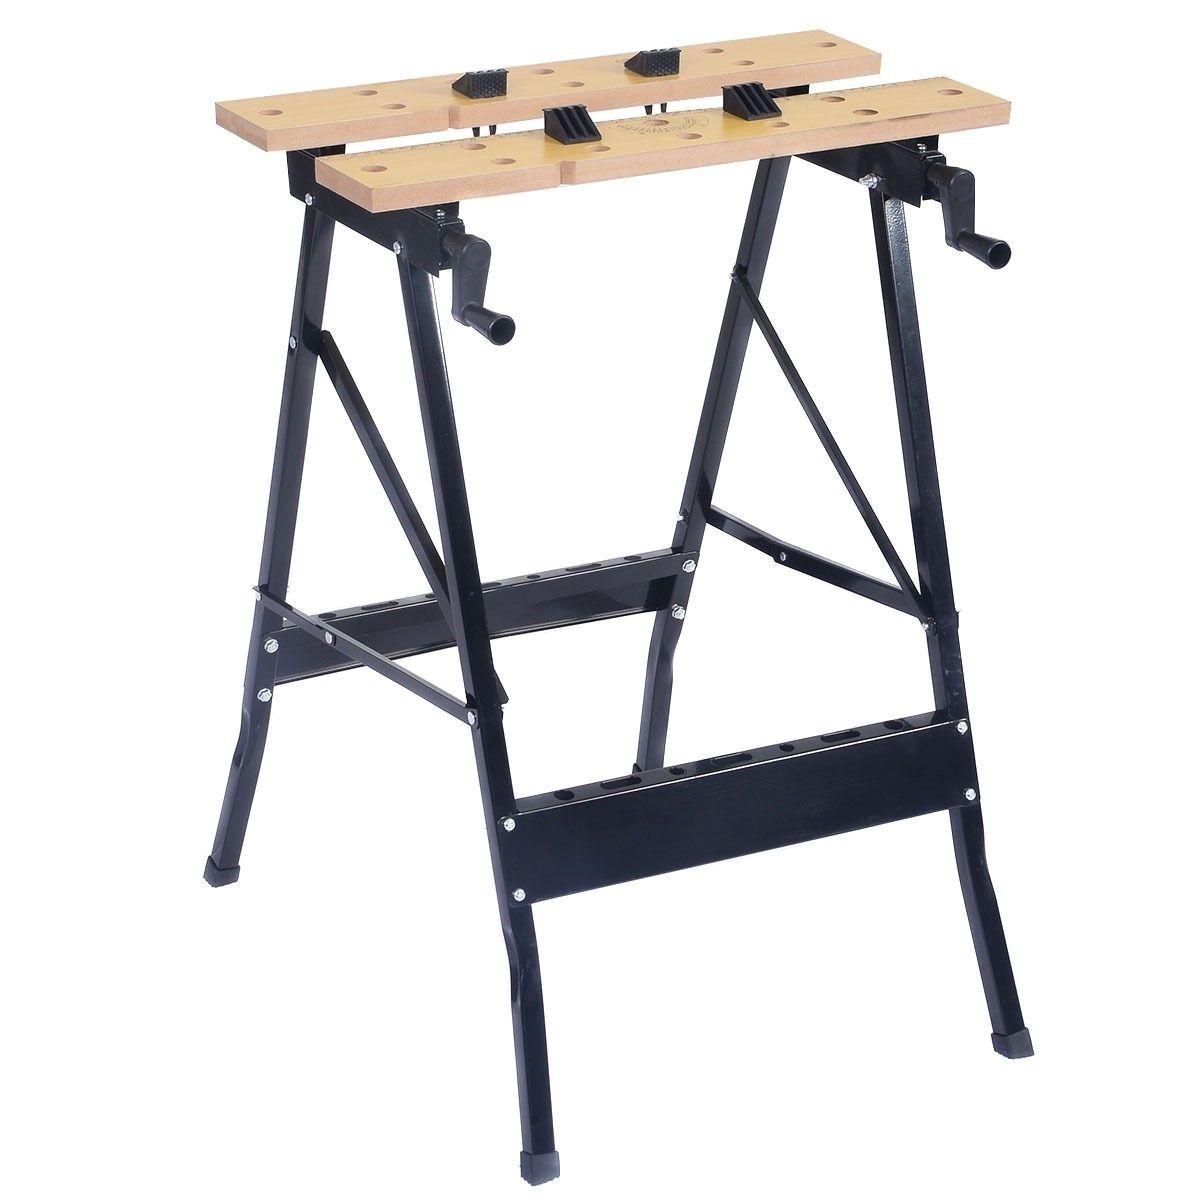 folding work bench table tool garage repair workshop benches furniture